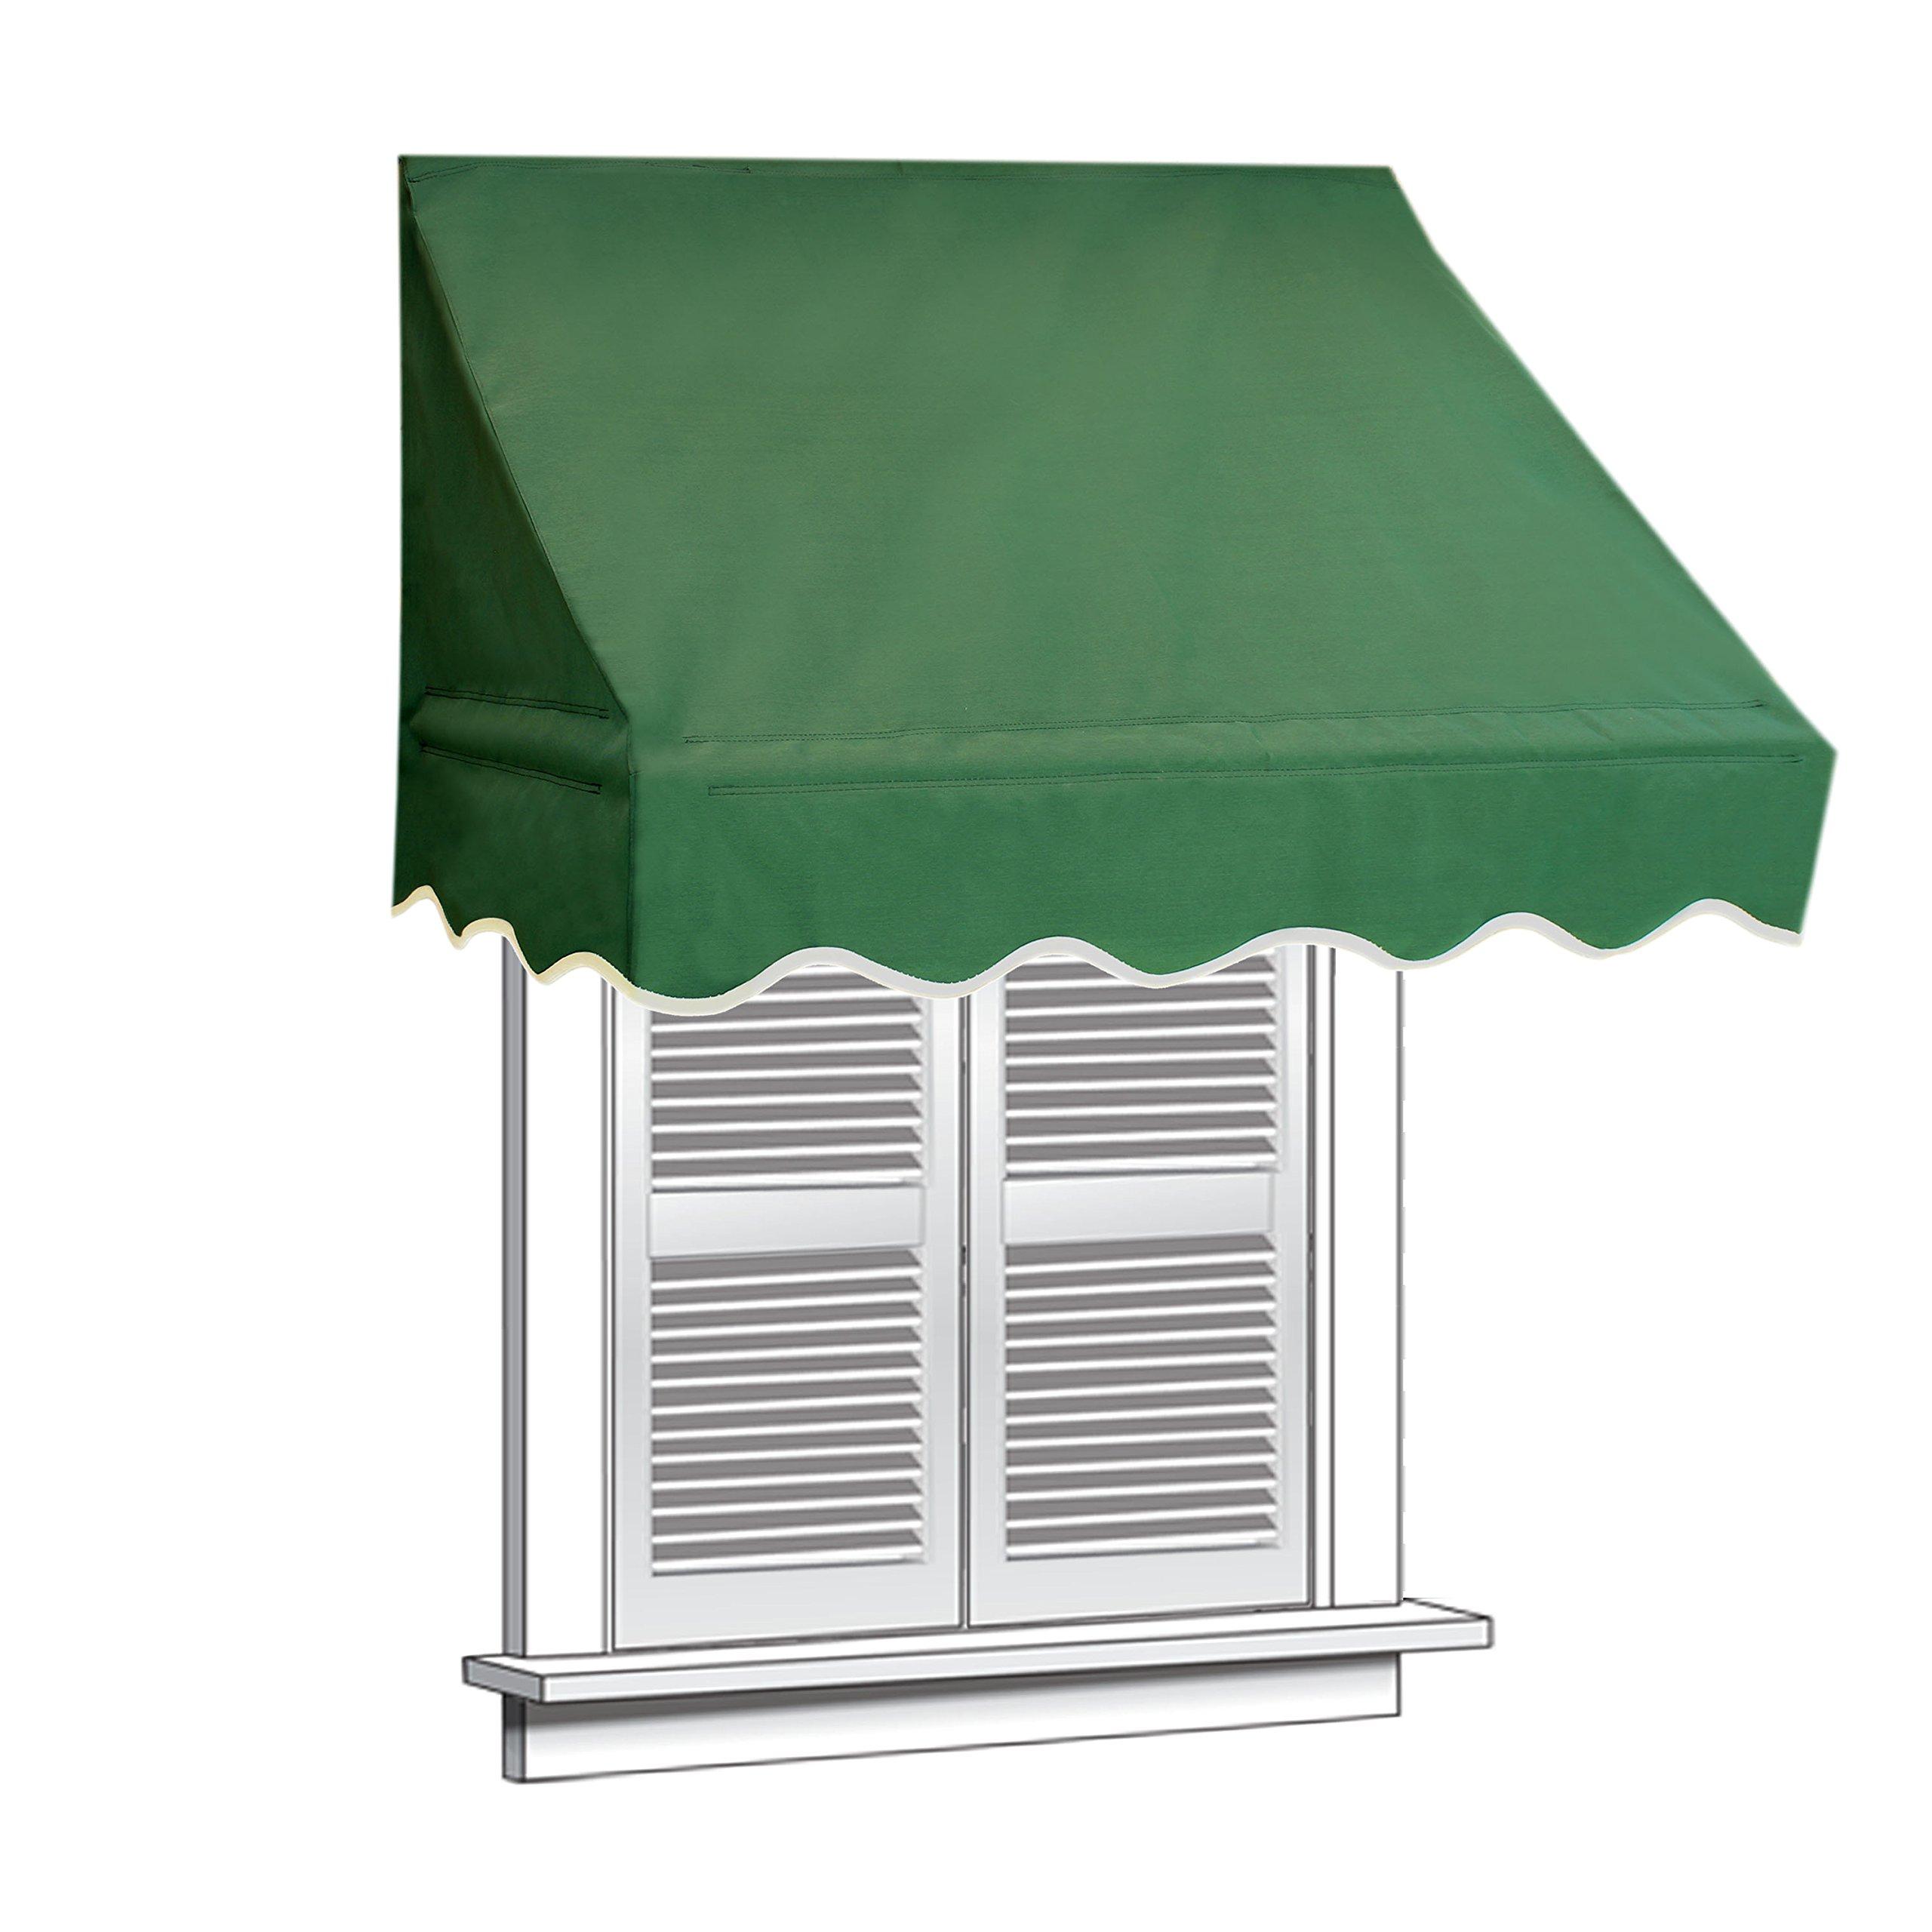 ALEKO WAW6X2GREEN39 Window Canopy Awning 6 x 2 Feet Green by ALEKO